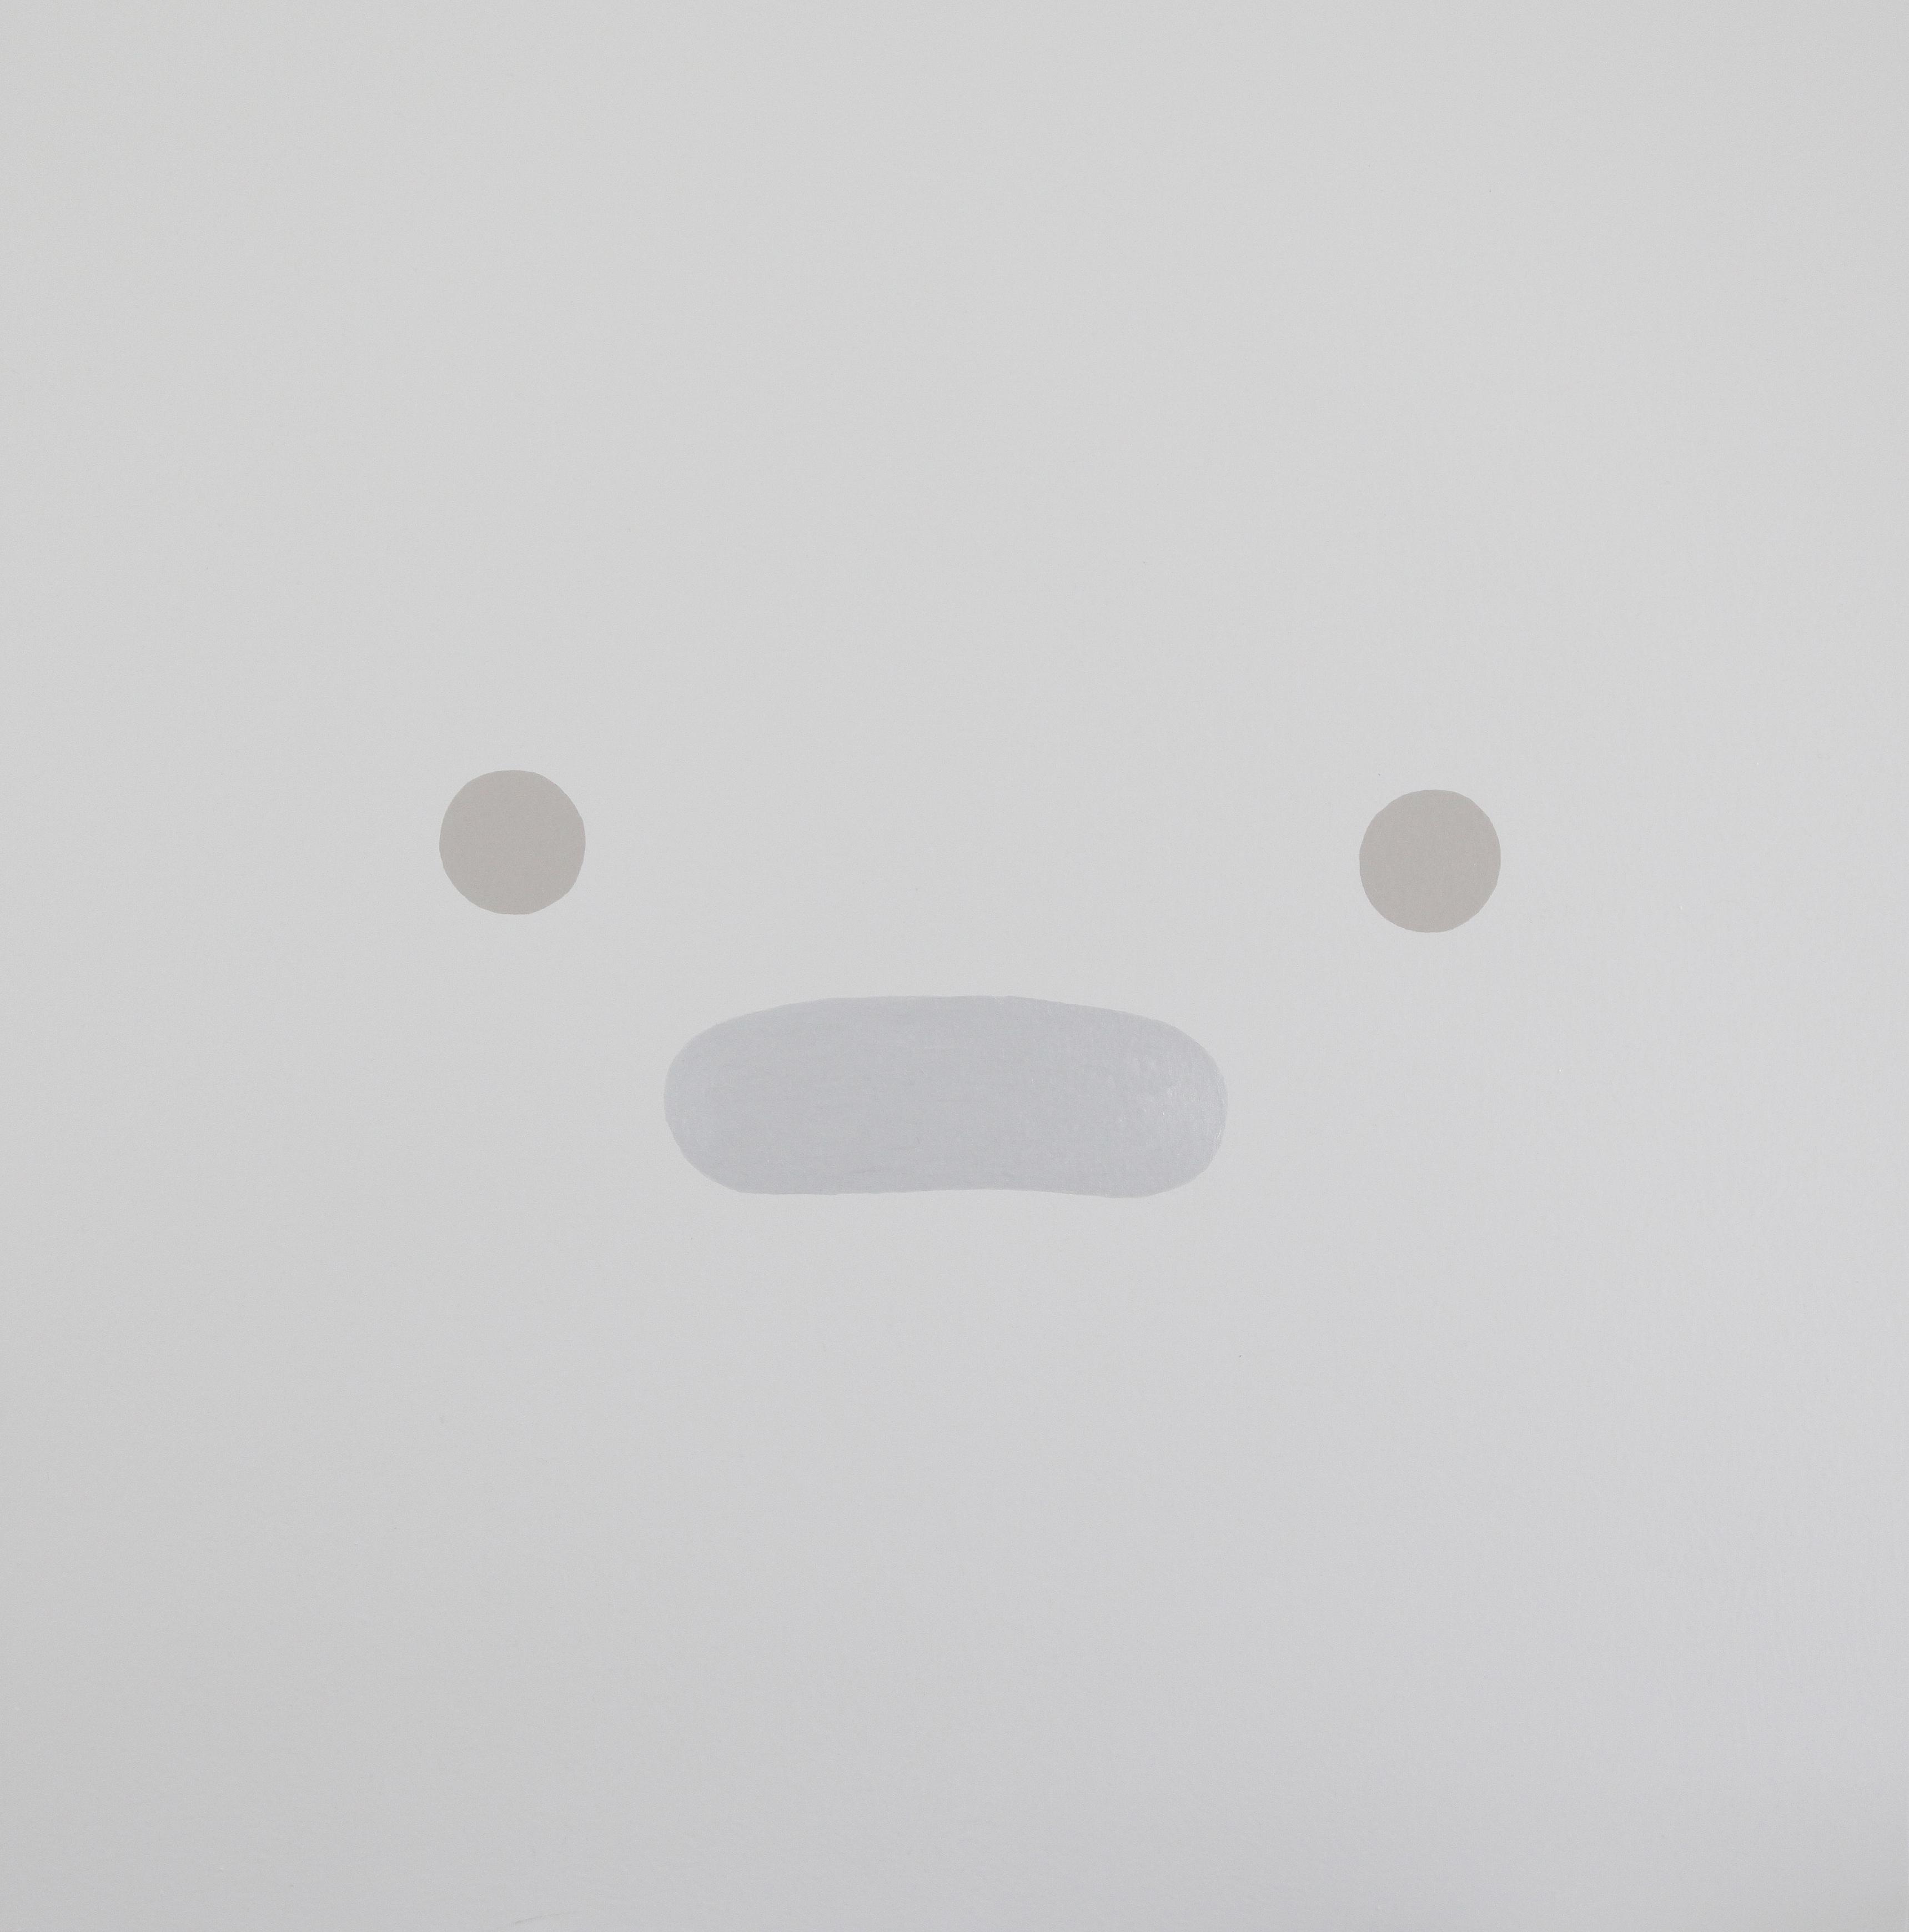 Silicon-Personal-Computer-album-packshot-hi-res